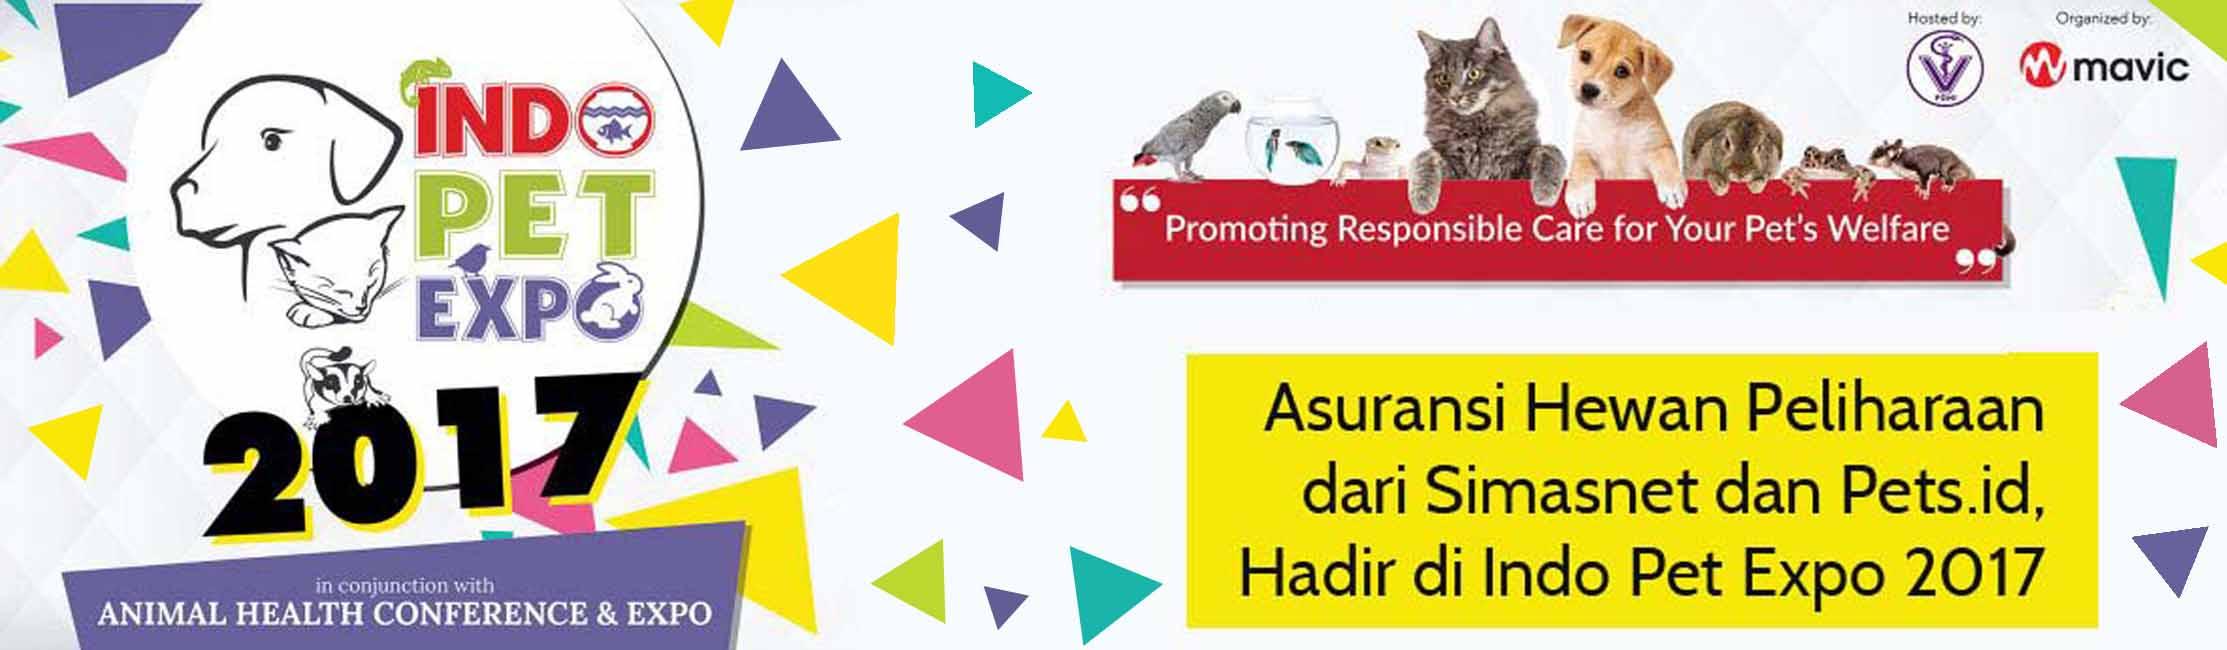 asuransi hewan peliharaan atau pet insurance simas insurtech hadir di indo pet expo 2017 bekerja sama dengan pets.id